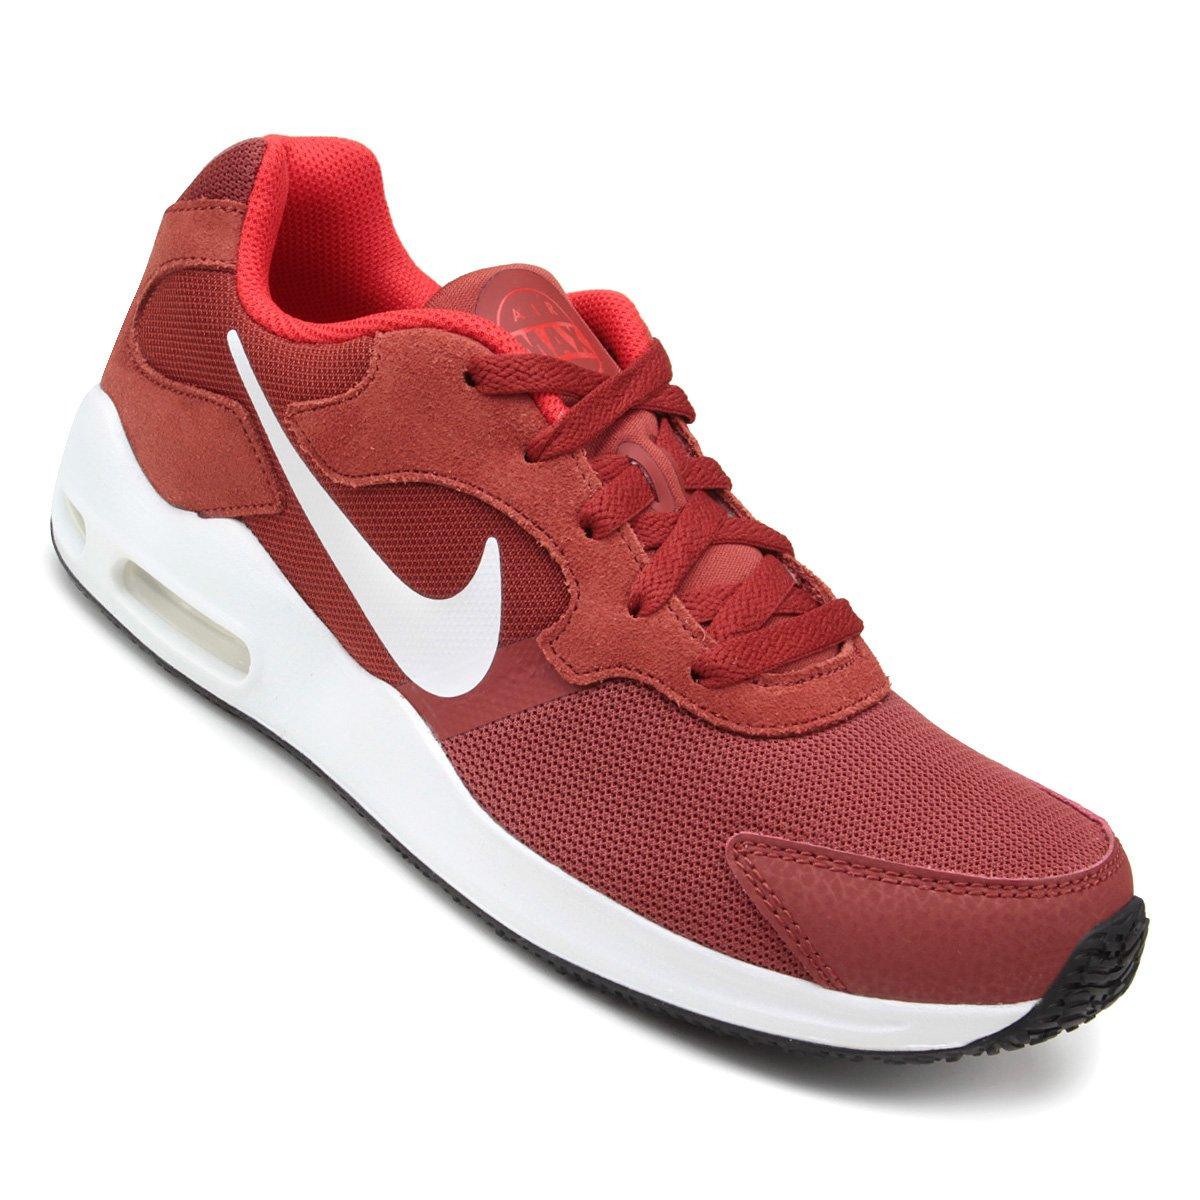 80bfbb67ab Tênis Nike Air Max Guile Masculino - Vermelho Escuro - Compre Agora ...